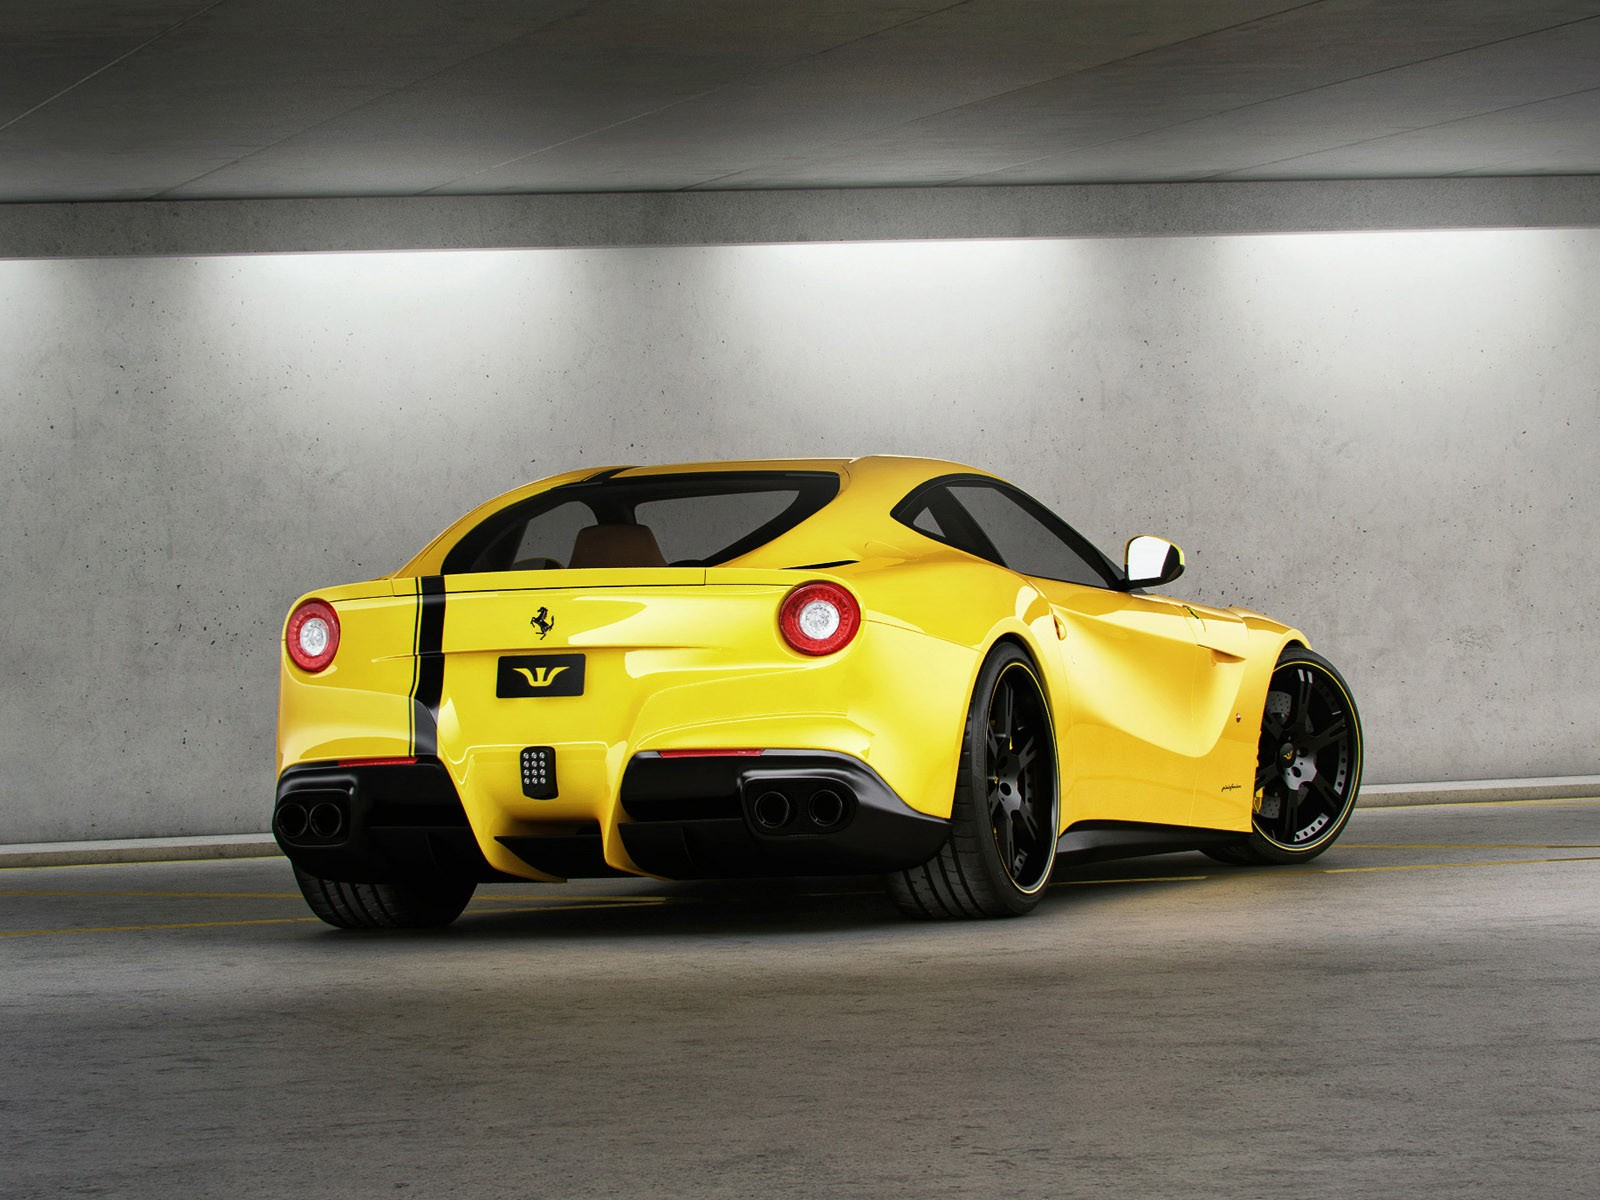 Ferrari F12 Berlinetta Wheelsandmore 2012